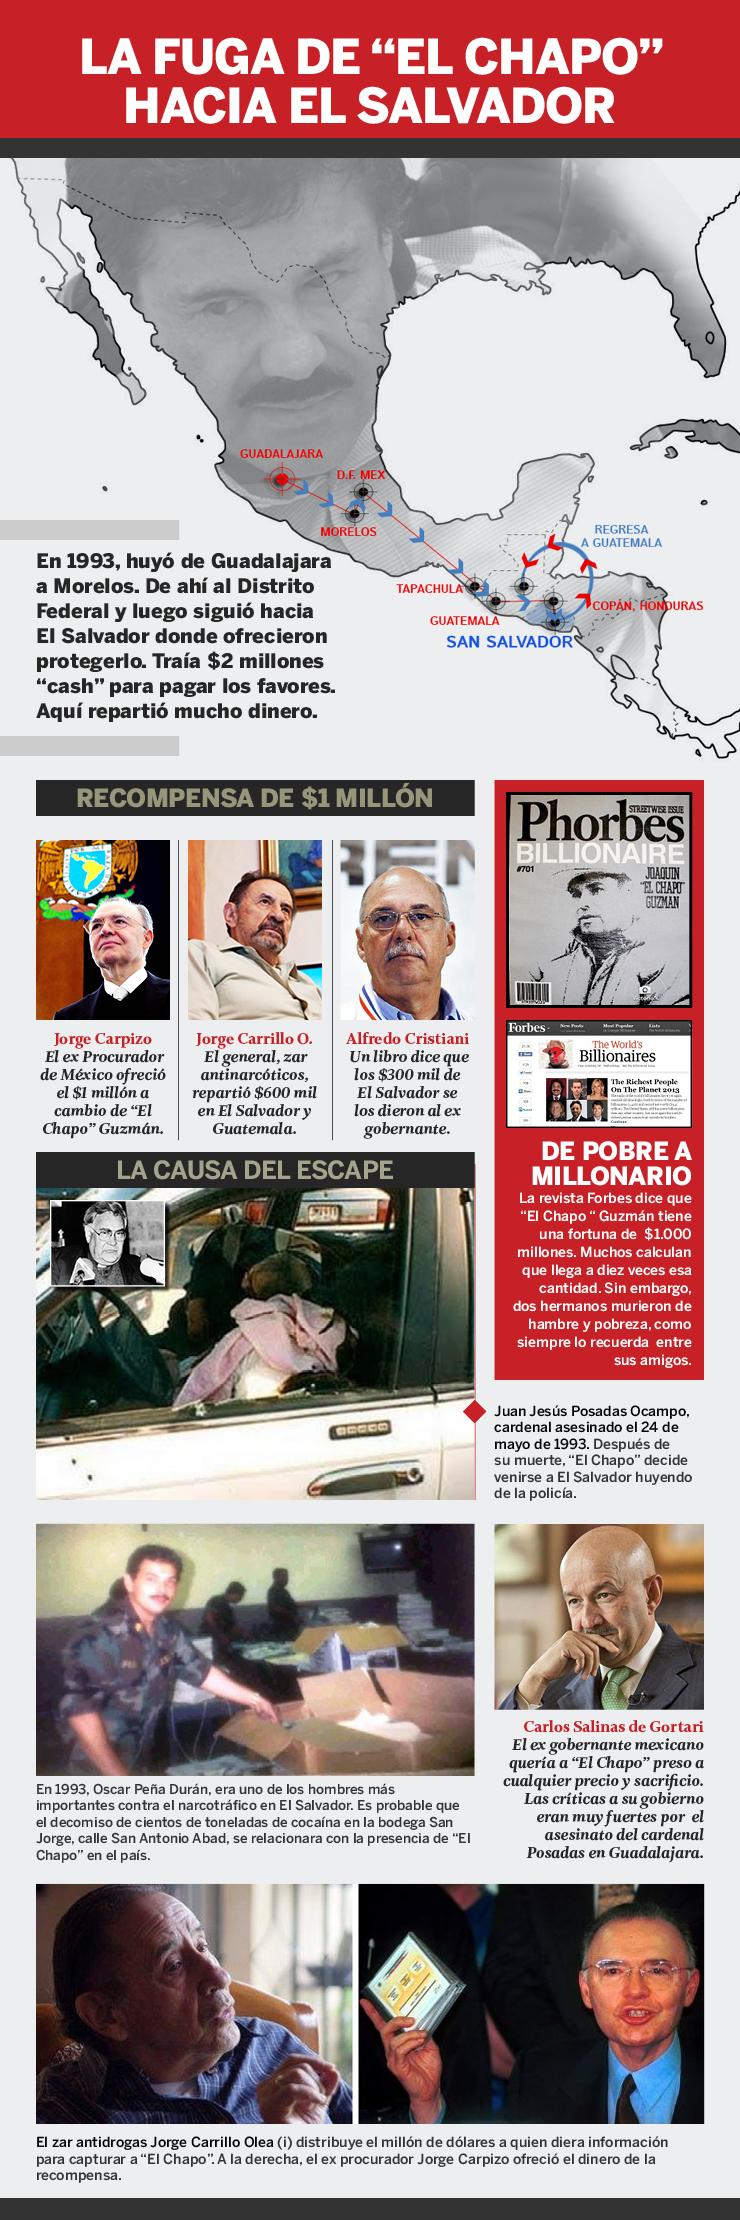 LA FUGA DEL EL CHAPO GUZMAN